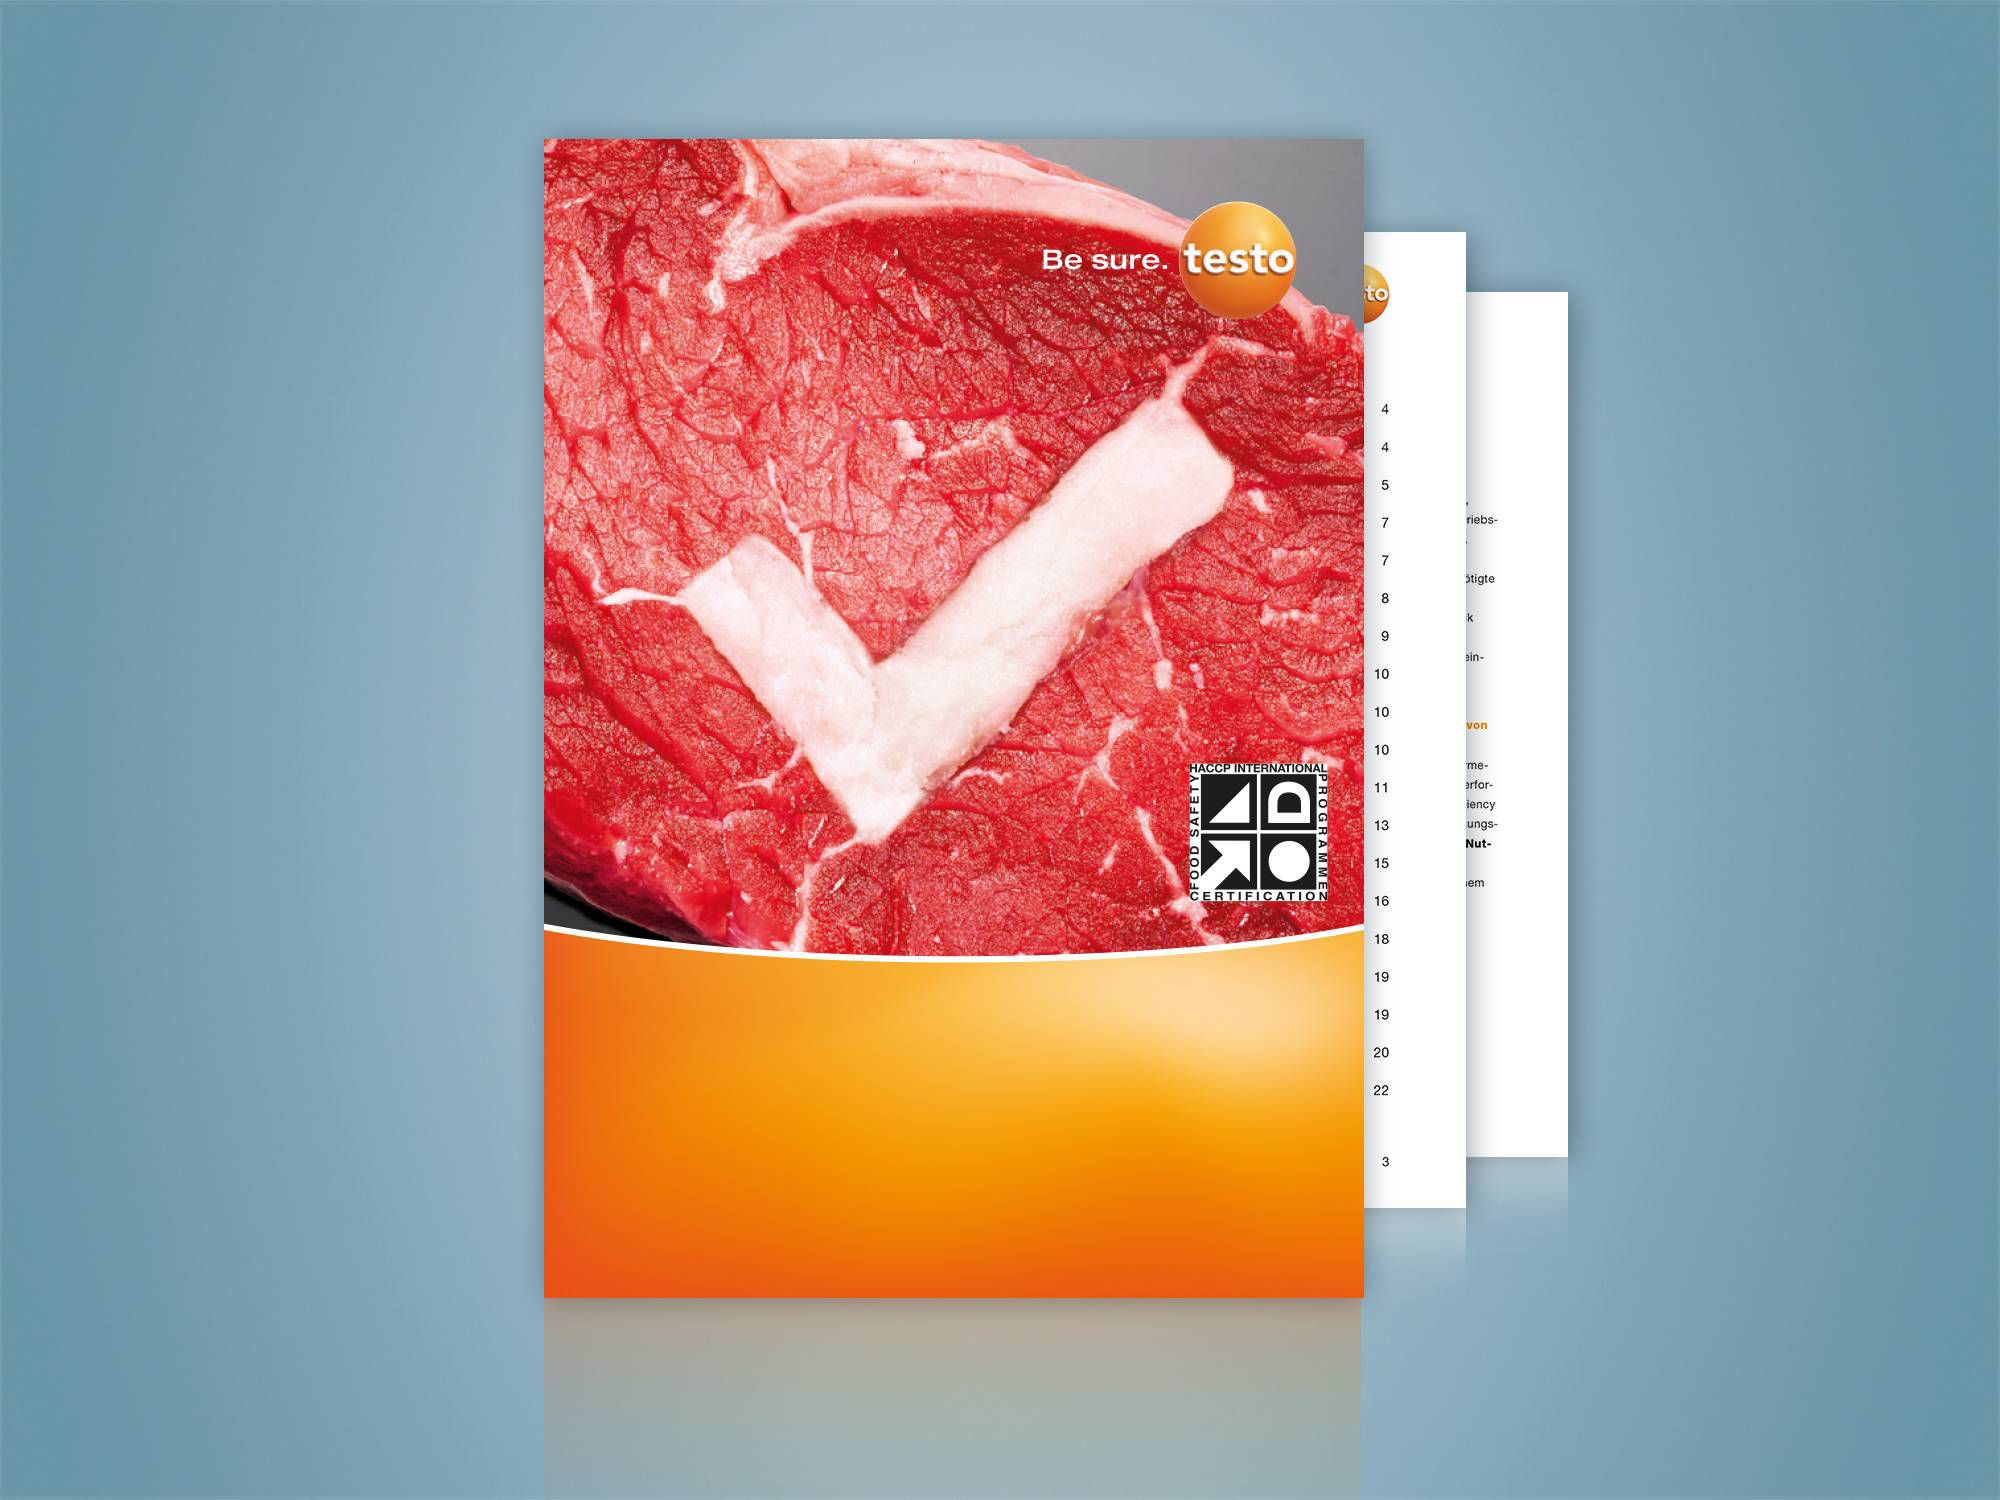 Pocket Guide Food Safety for downloading